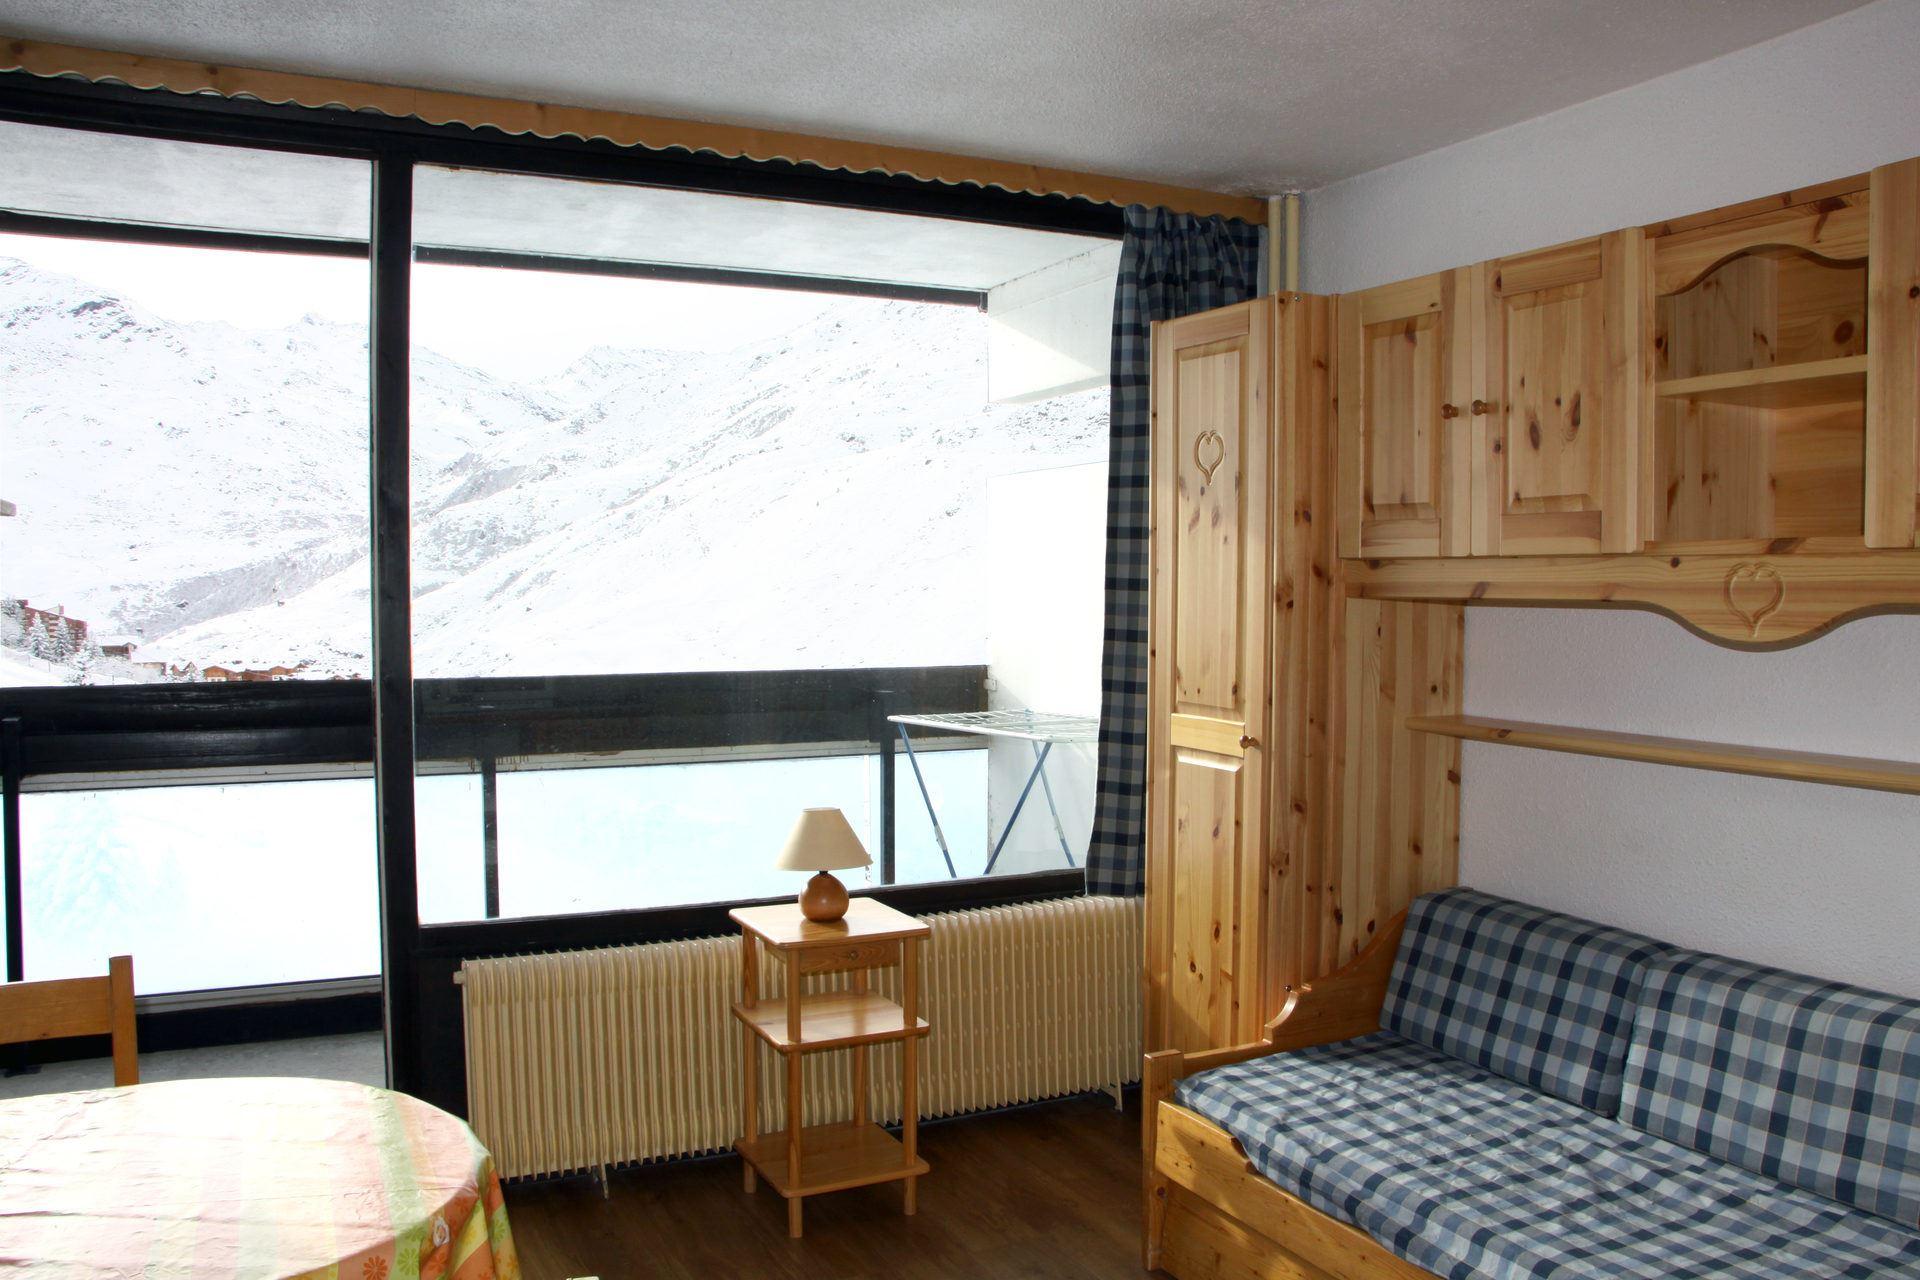 Studio 2 Pers skis aux pieds / DORONS 602